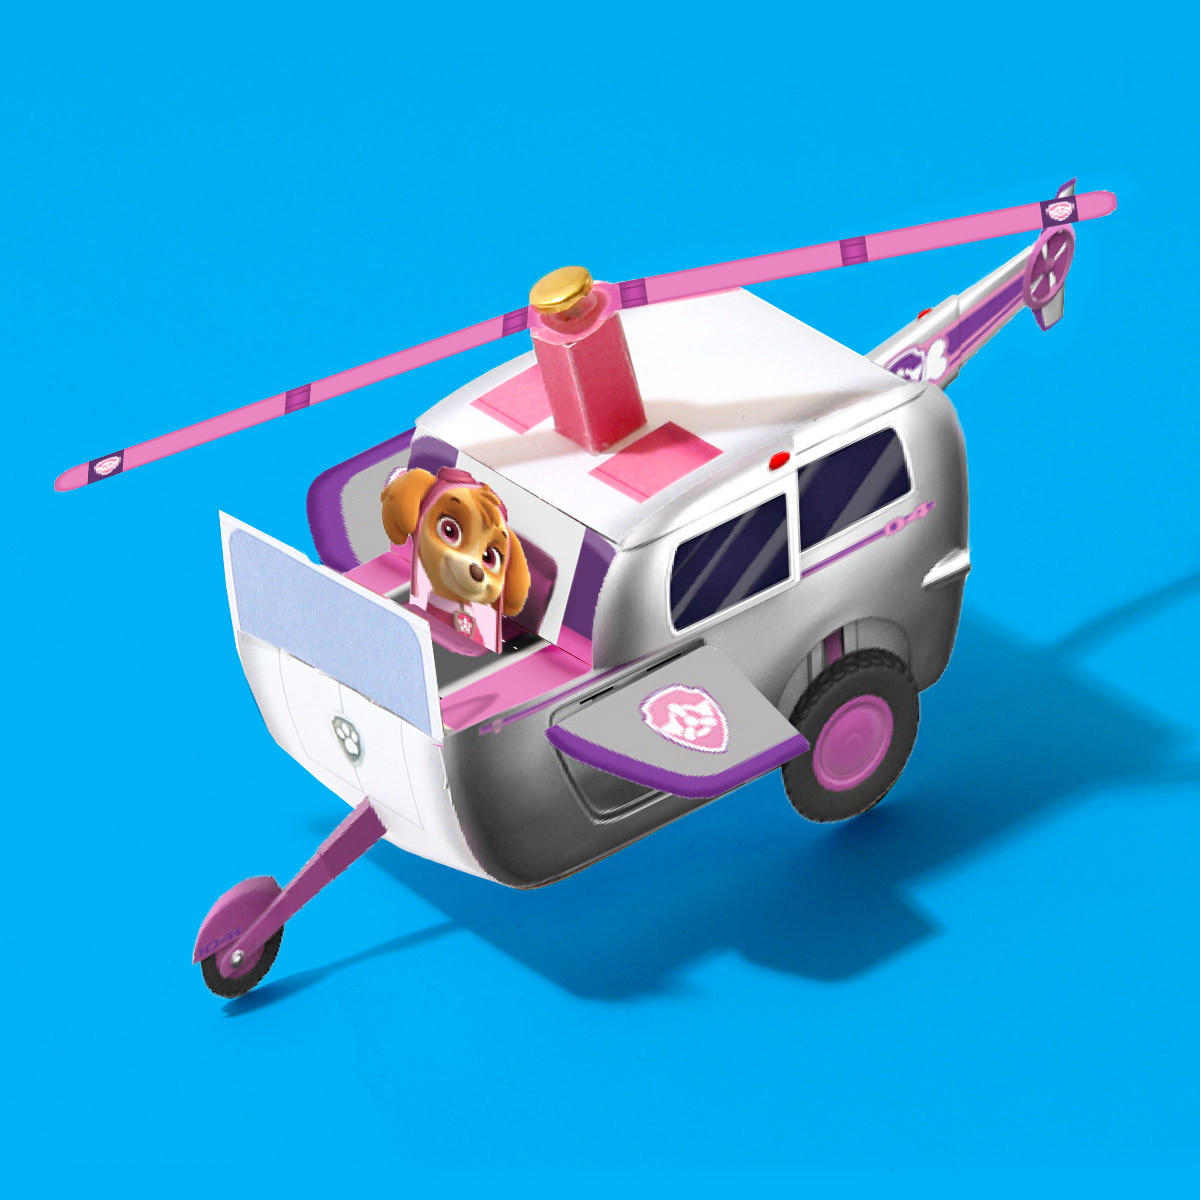 PAW Patrol Skye Vehicle Toy Template